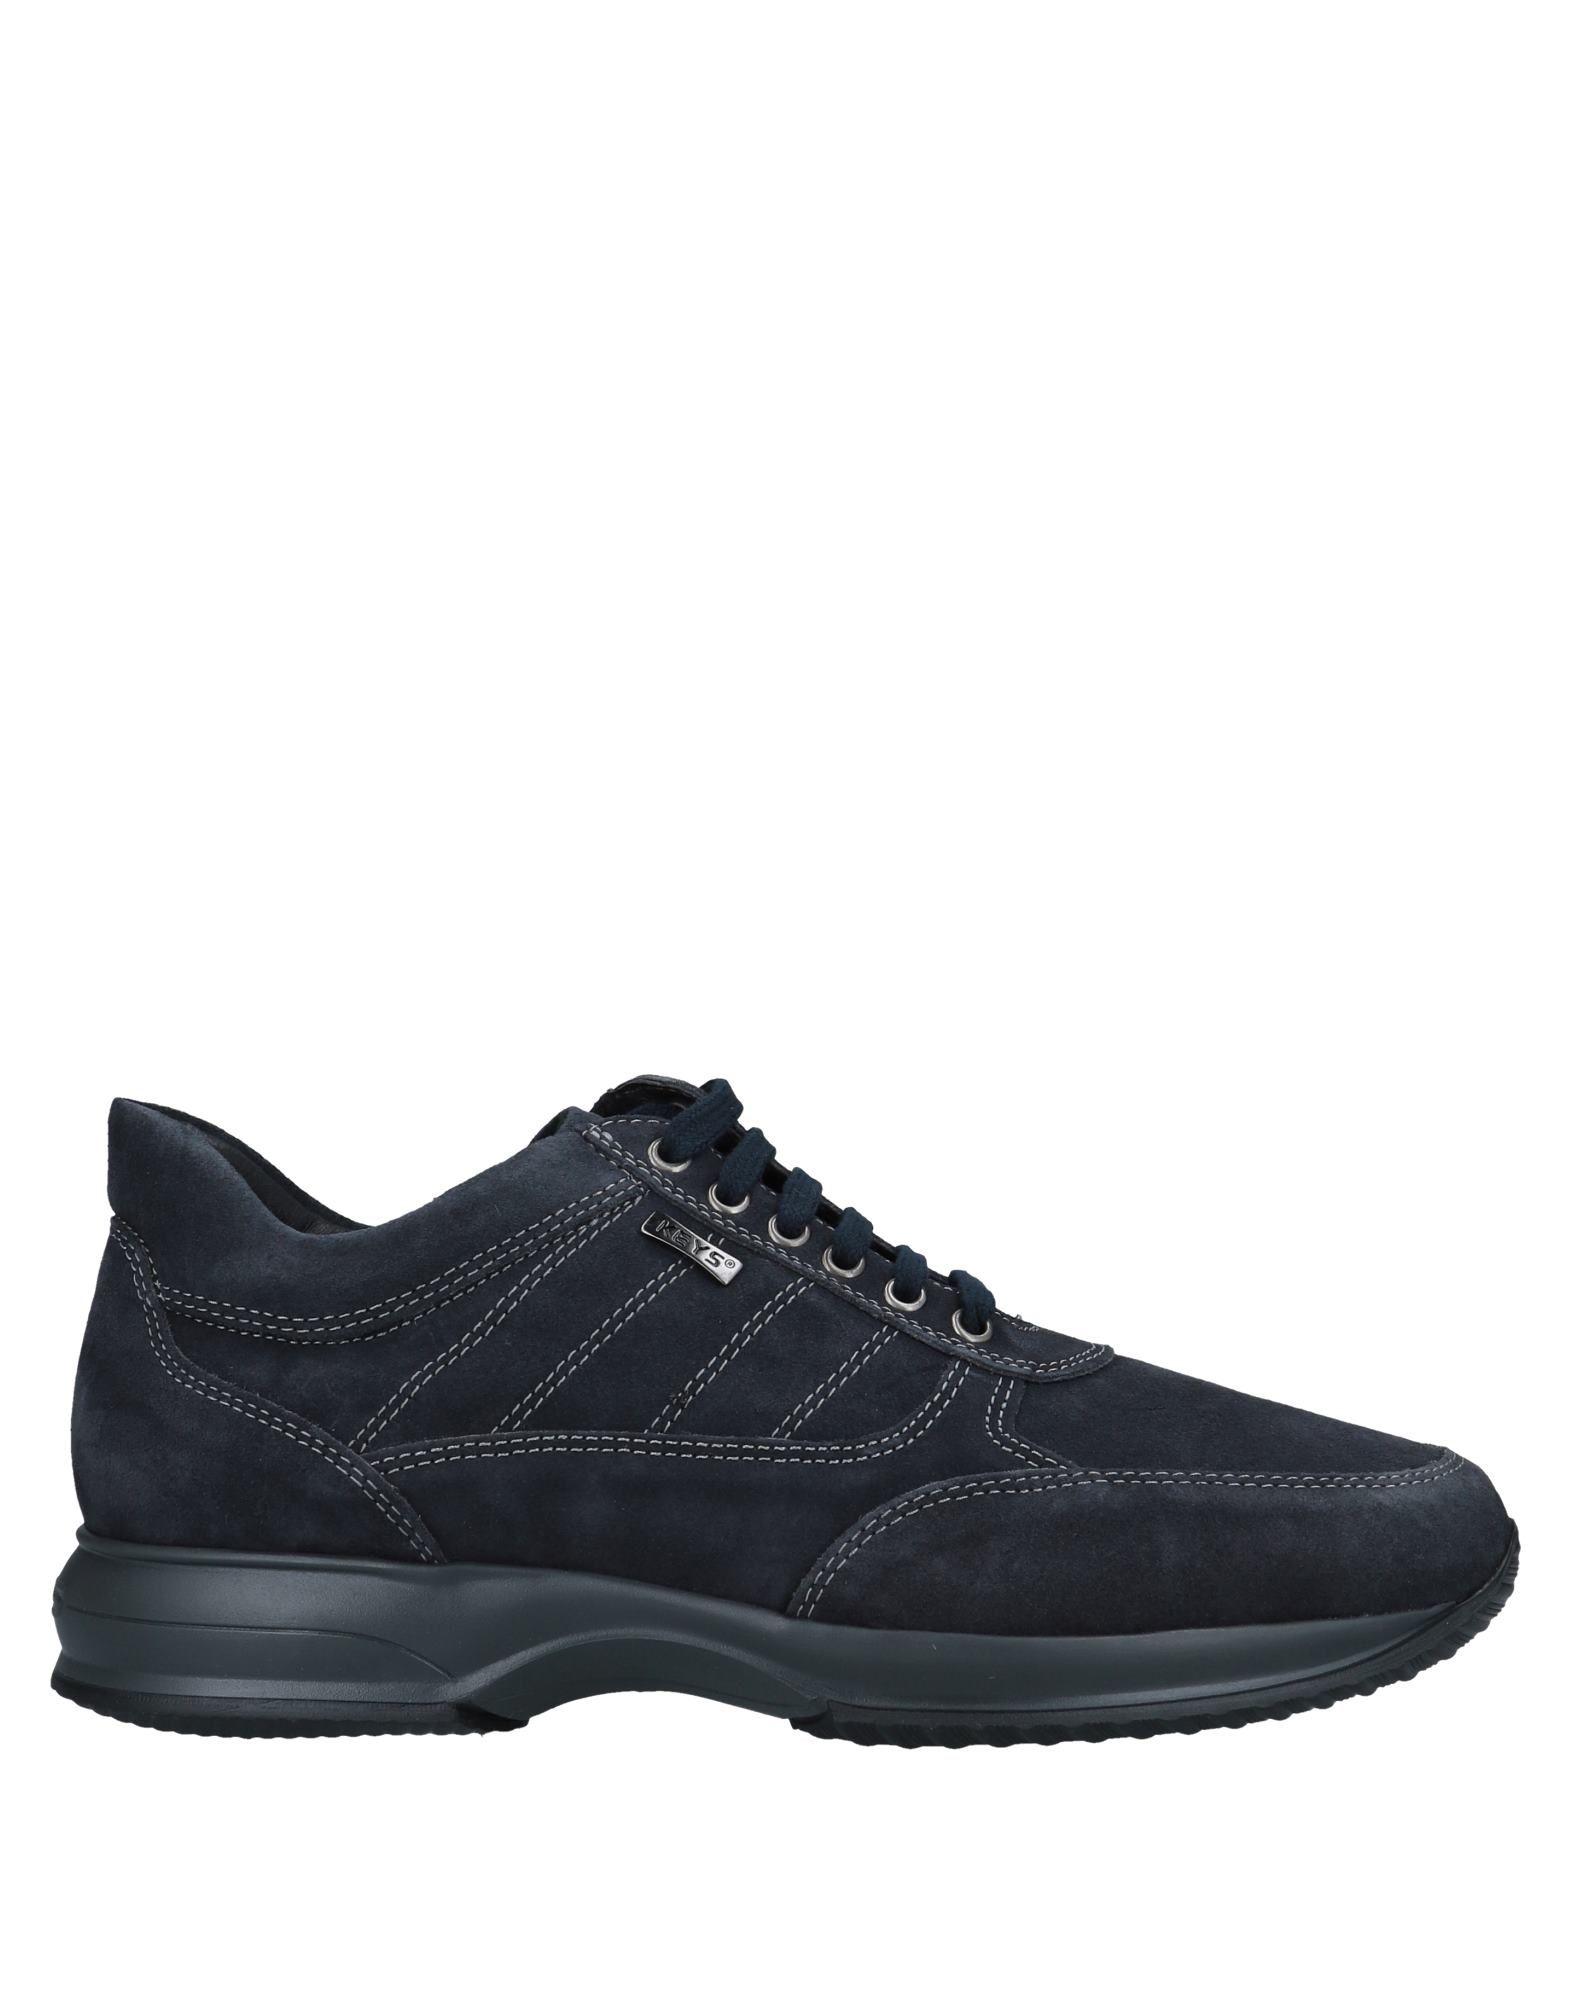 Rabatt echte Schuhe Turnschuhes Herren 11549667FF Keys